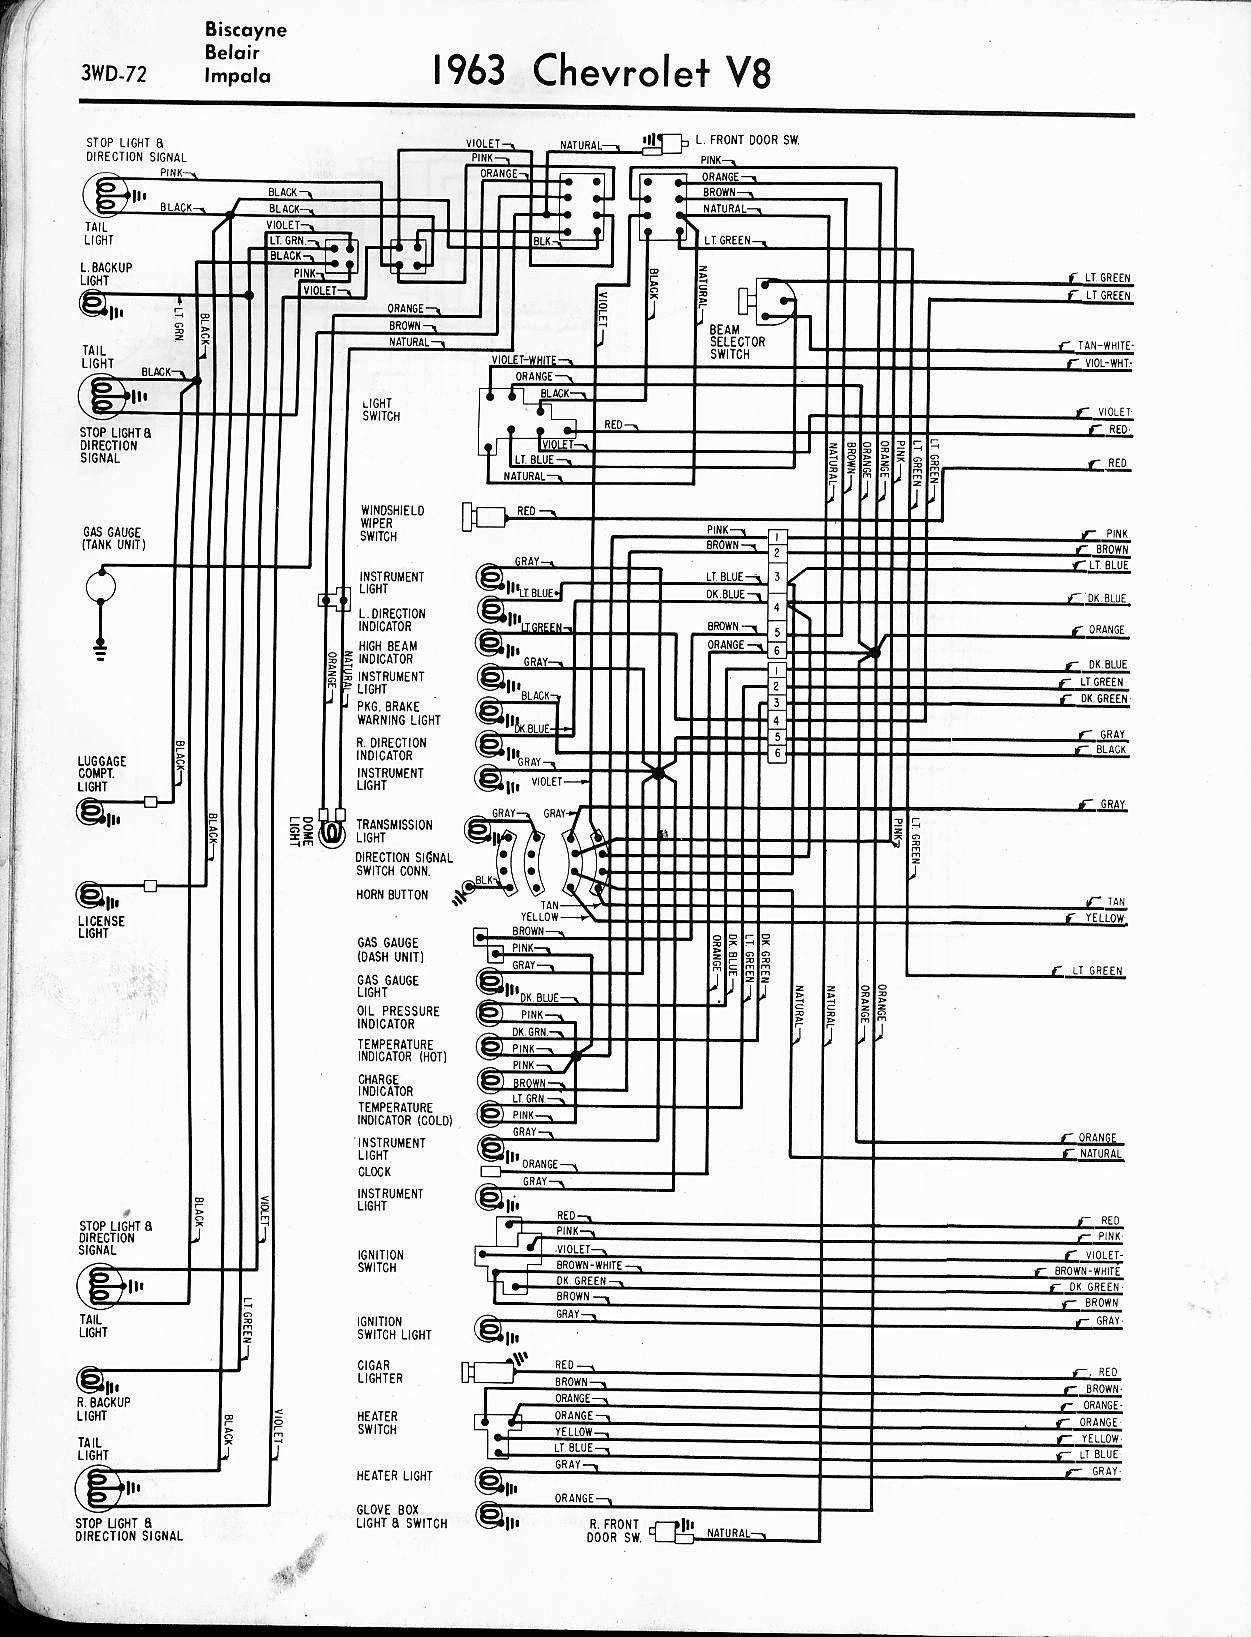 1962 Chevy Truck Wiring Diagram In 2021 Chevrolet Trucks Diagram Chevy Trucks